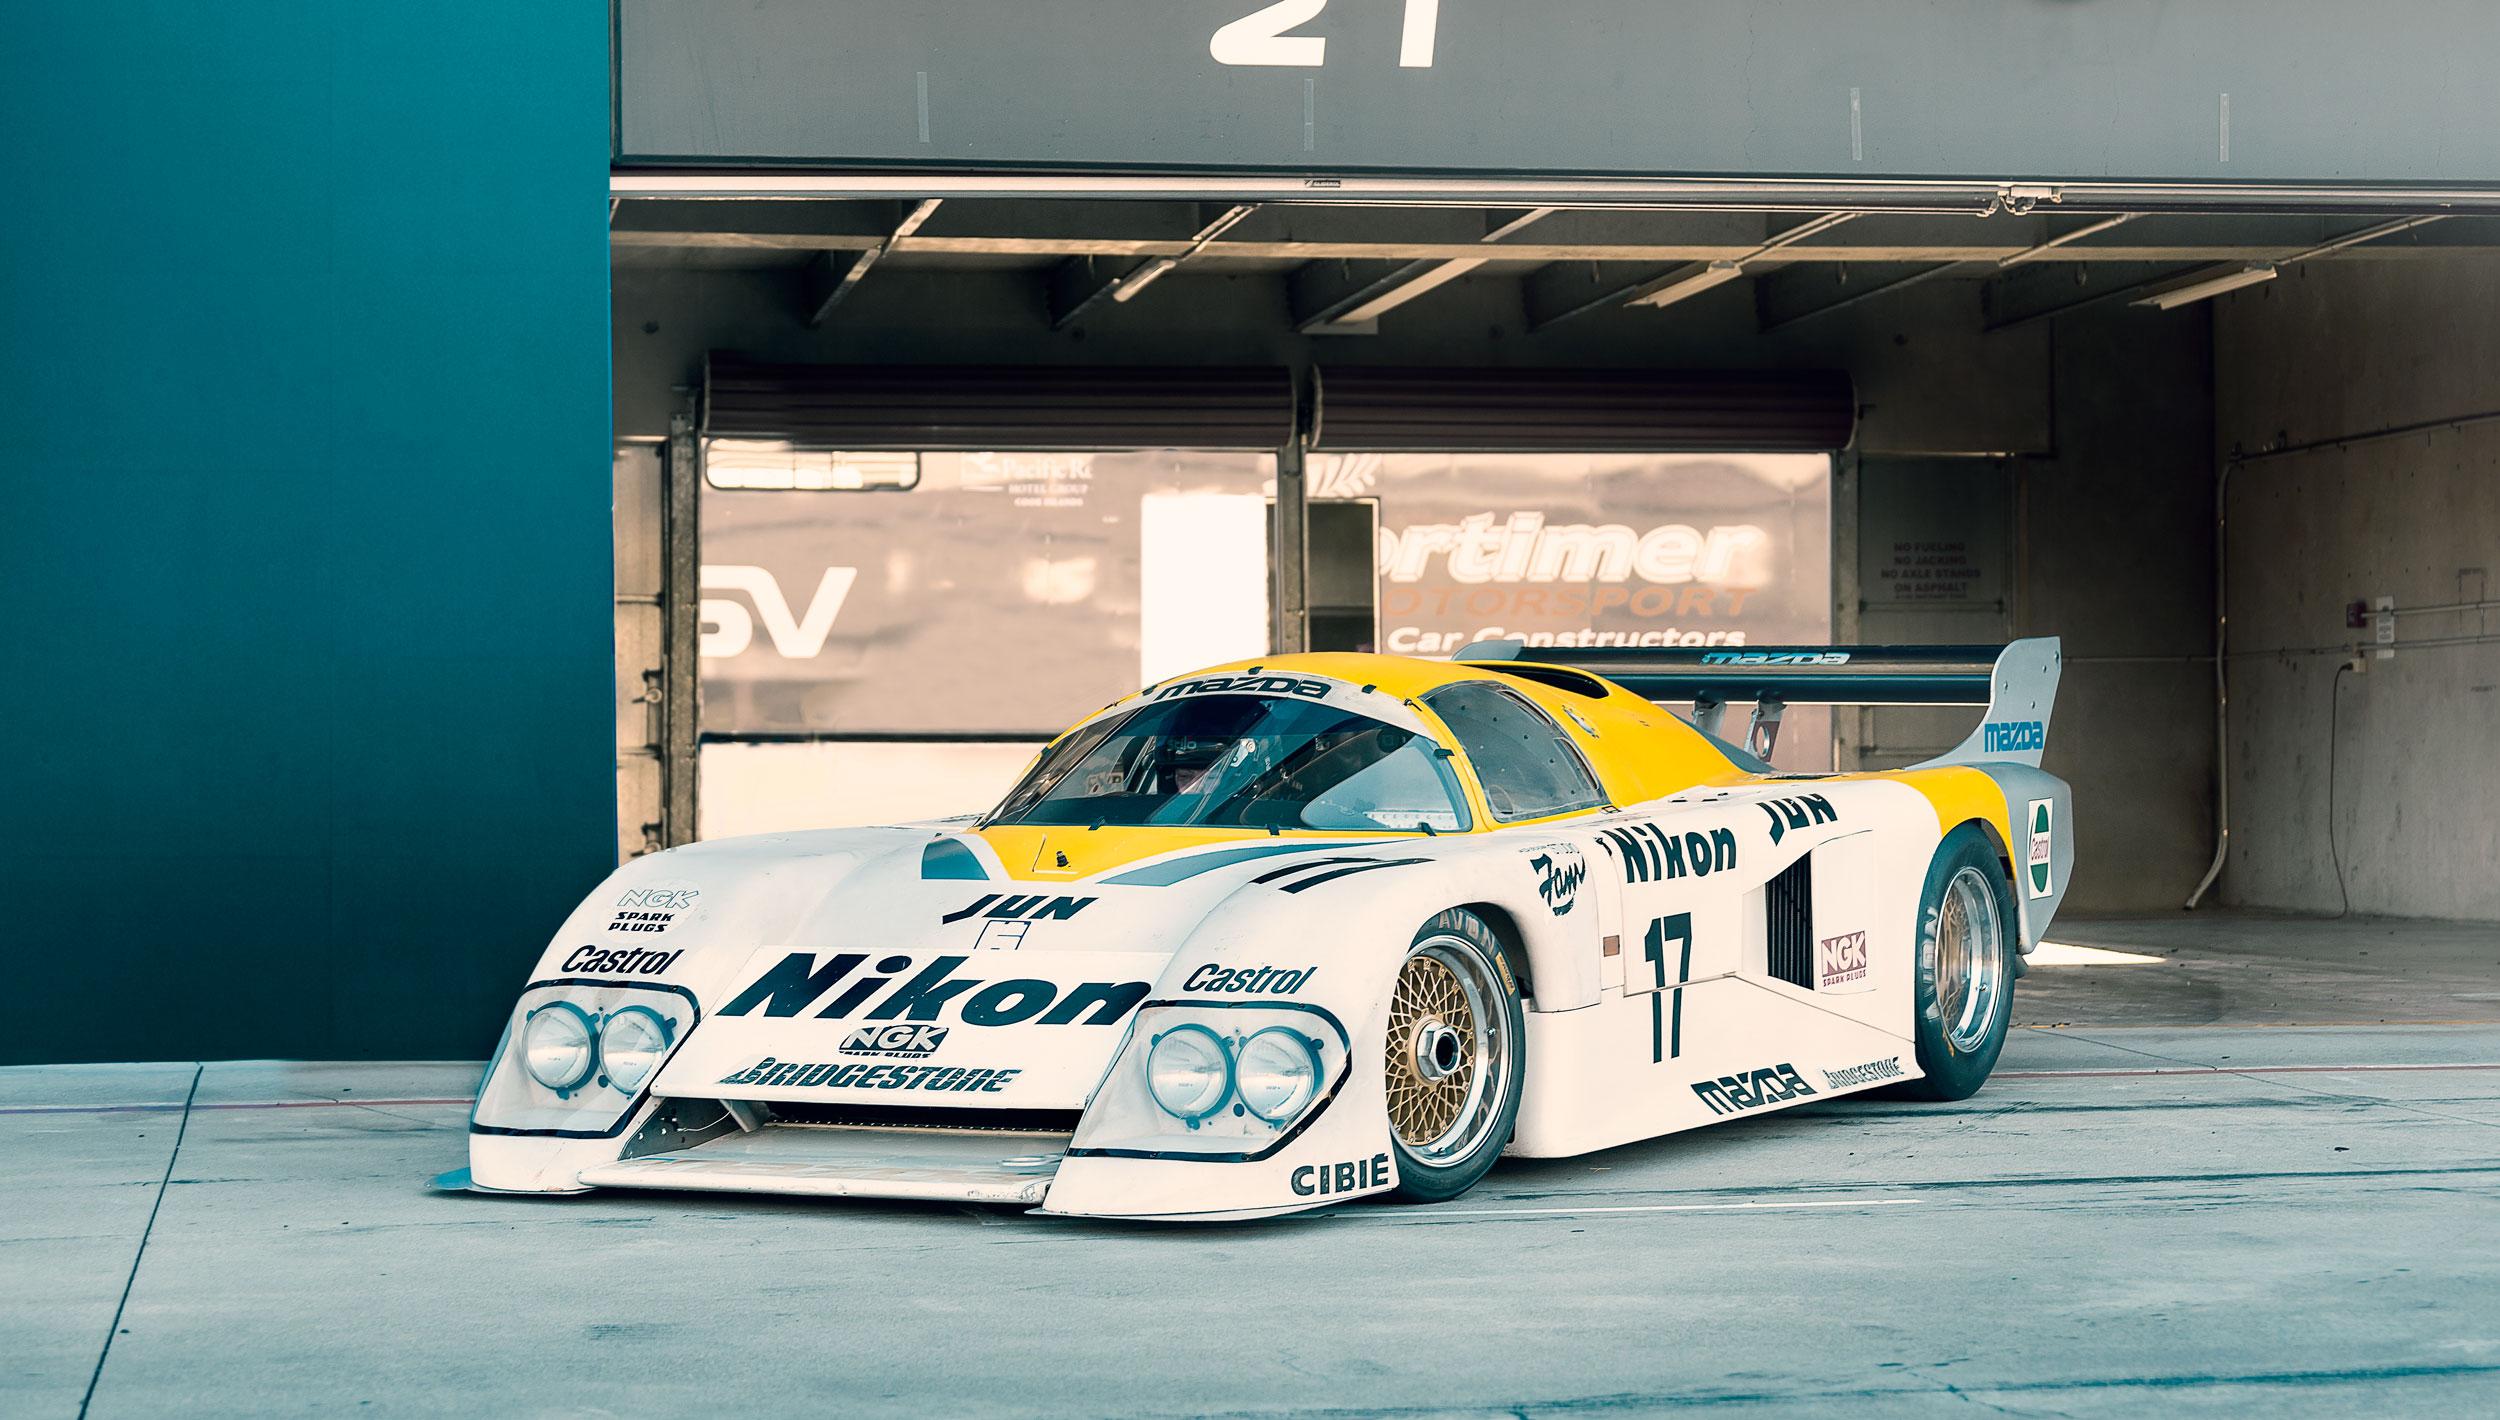 pit lane-Mazdaspeed-84G-camleggettphoto.jpg